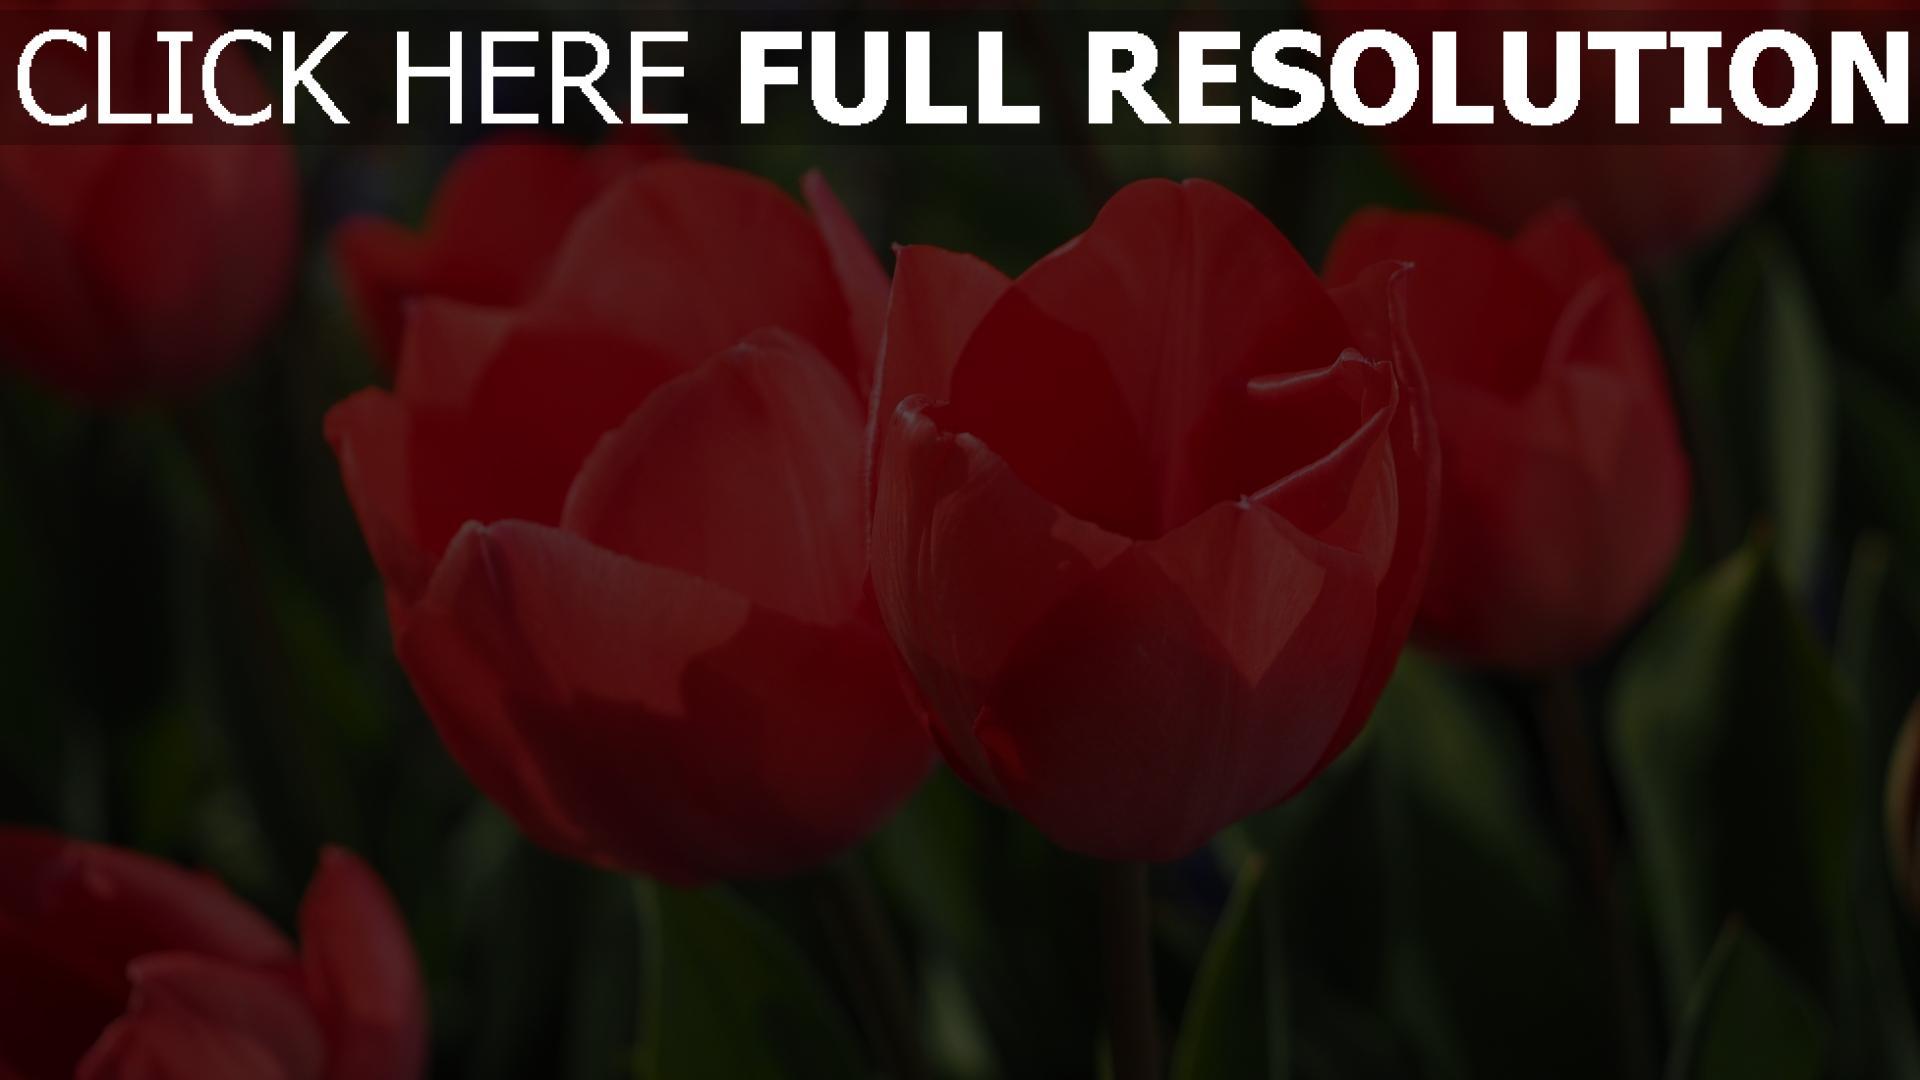 hd hintergrundbilder rote tulpen bl ten st ngel bl tter desktop hintergrund. Black Bedroom Furniture Sets. Home Design Ideas